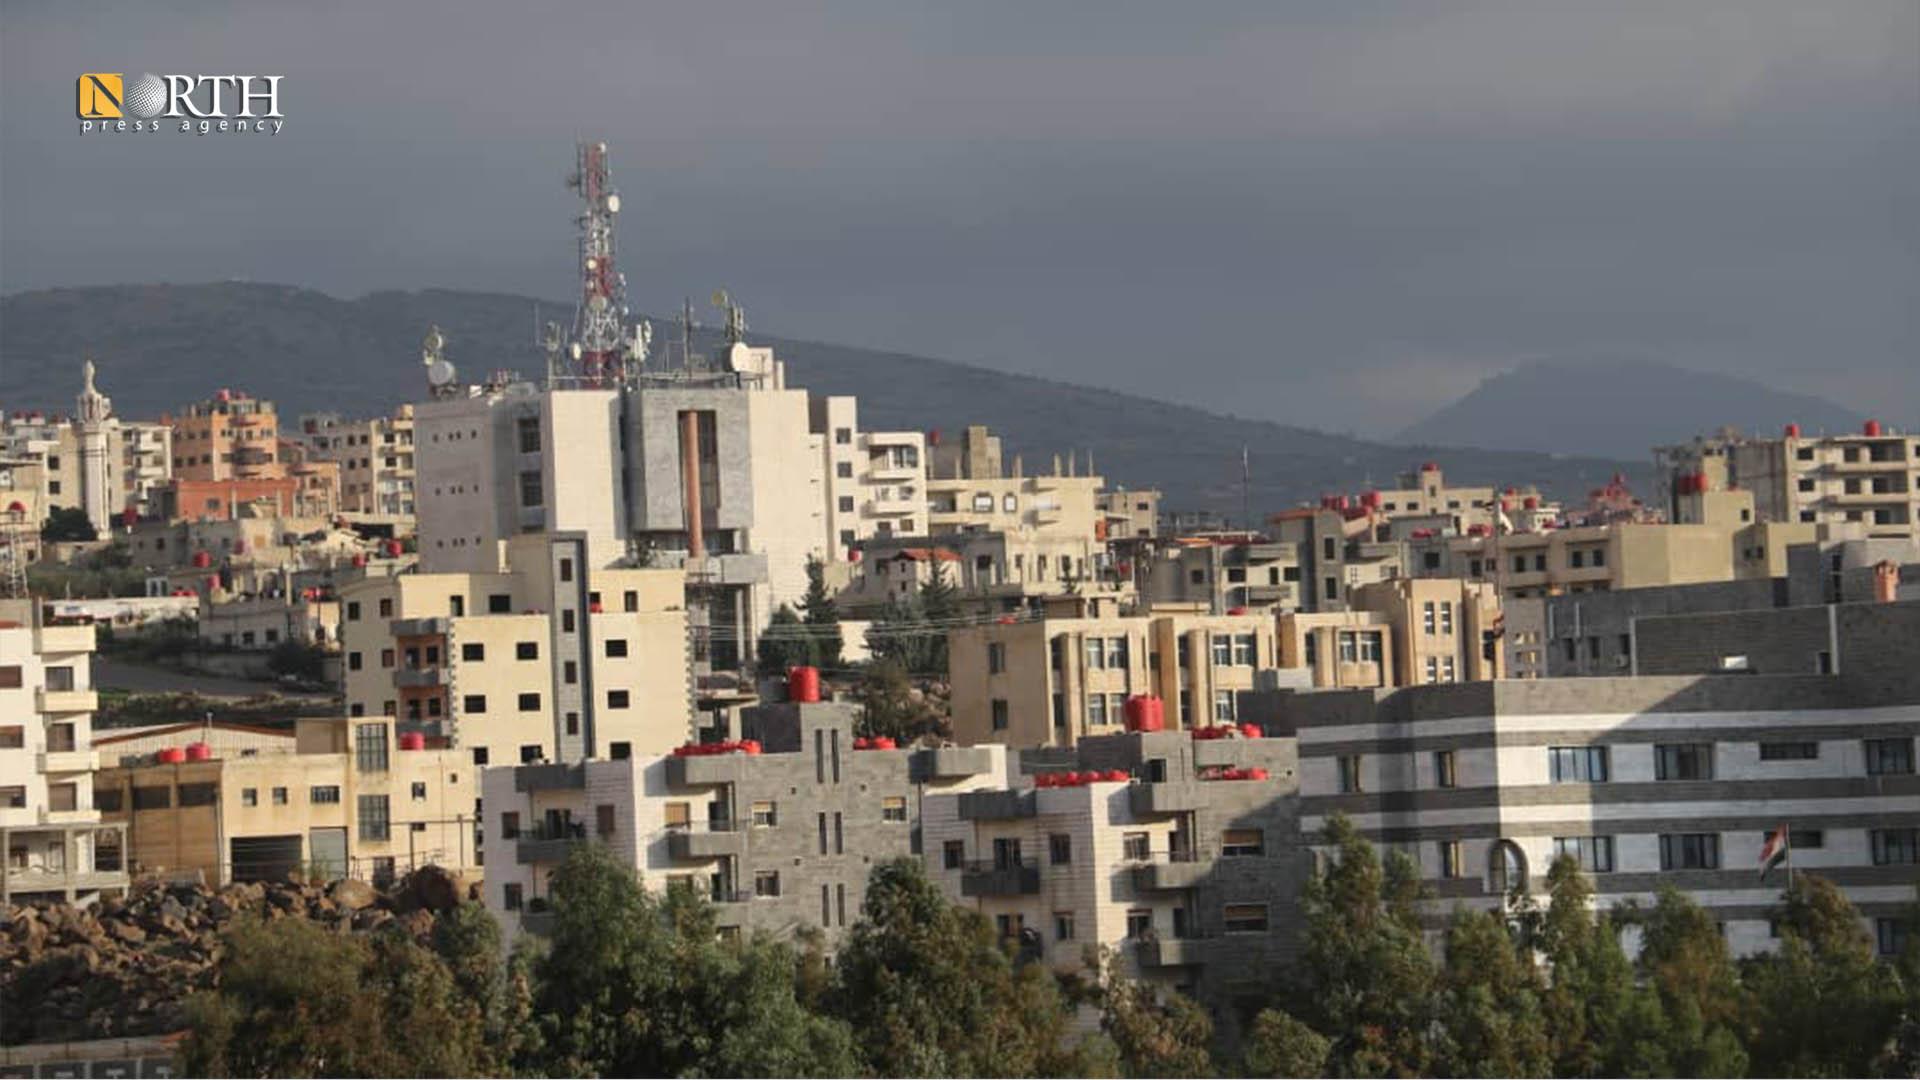 the city of Suwayda - North Press